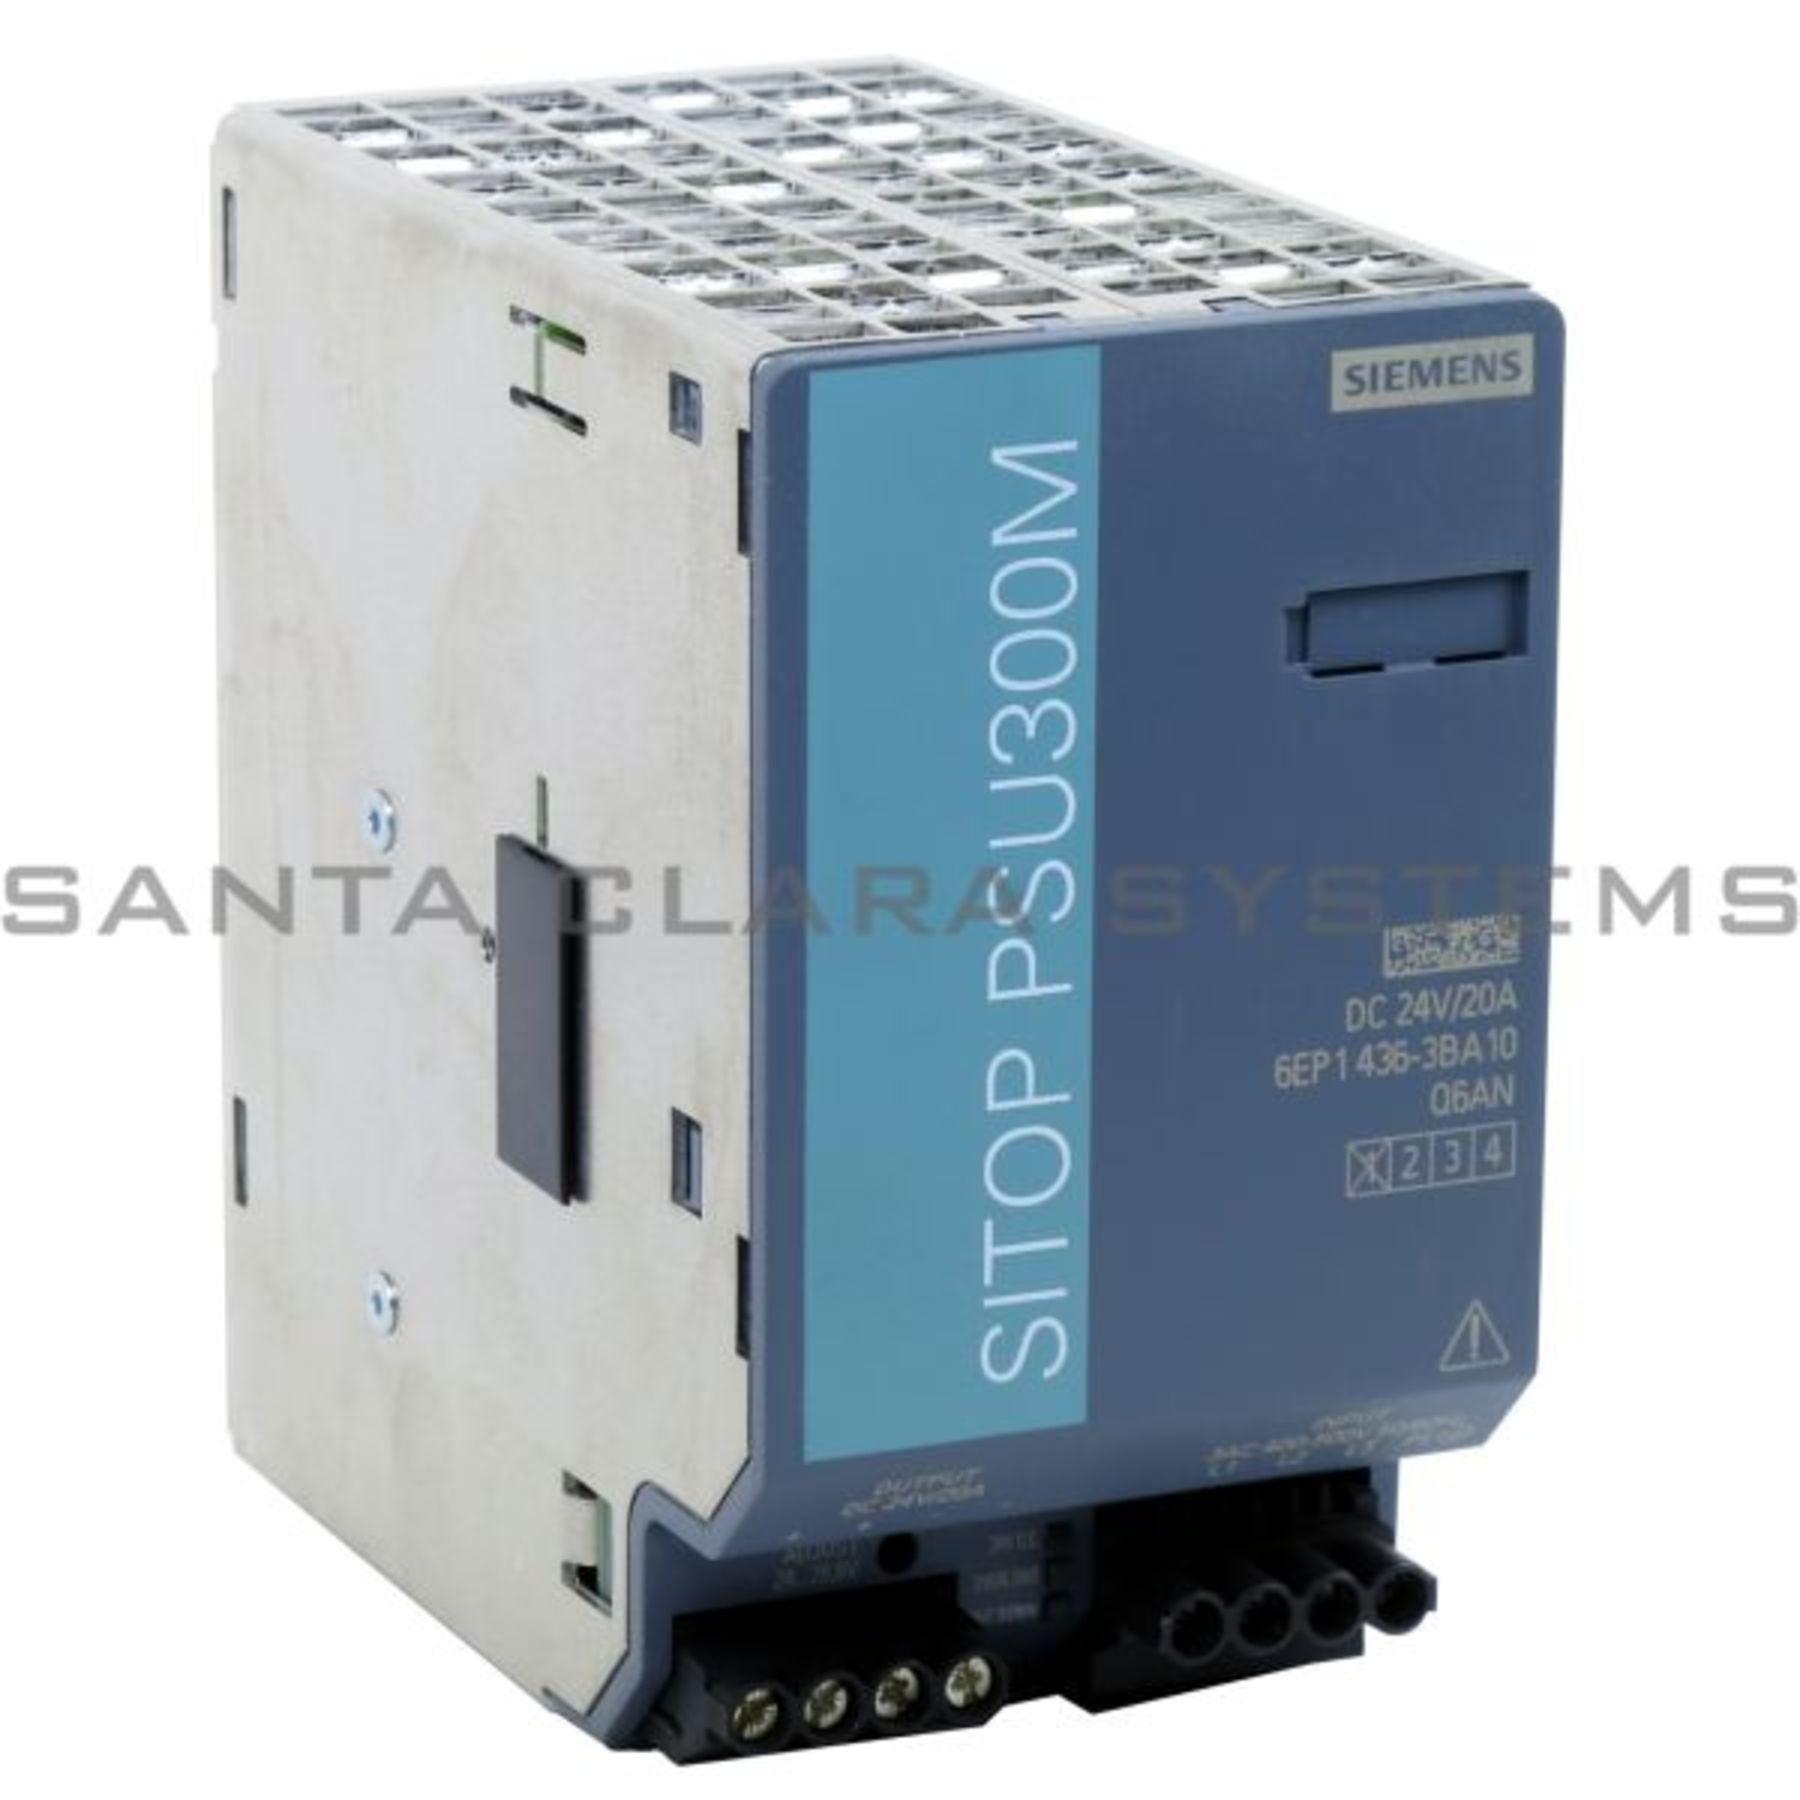 used Siemens SITOP Power 20 6EP1436-3BA00 6EP1 436-3BA00 E:02 Power Supply